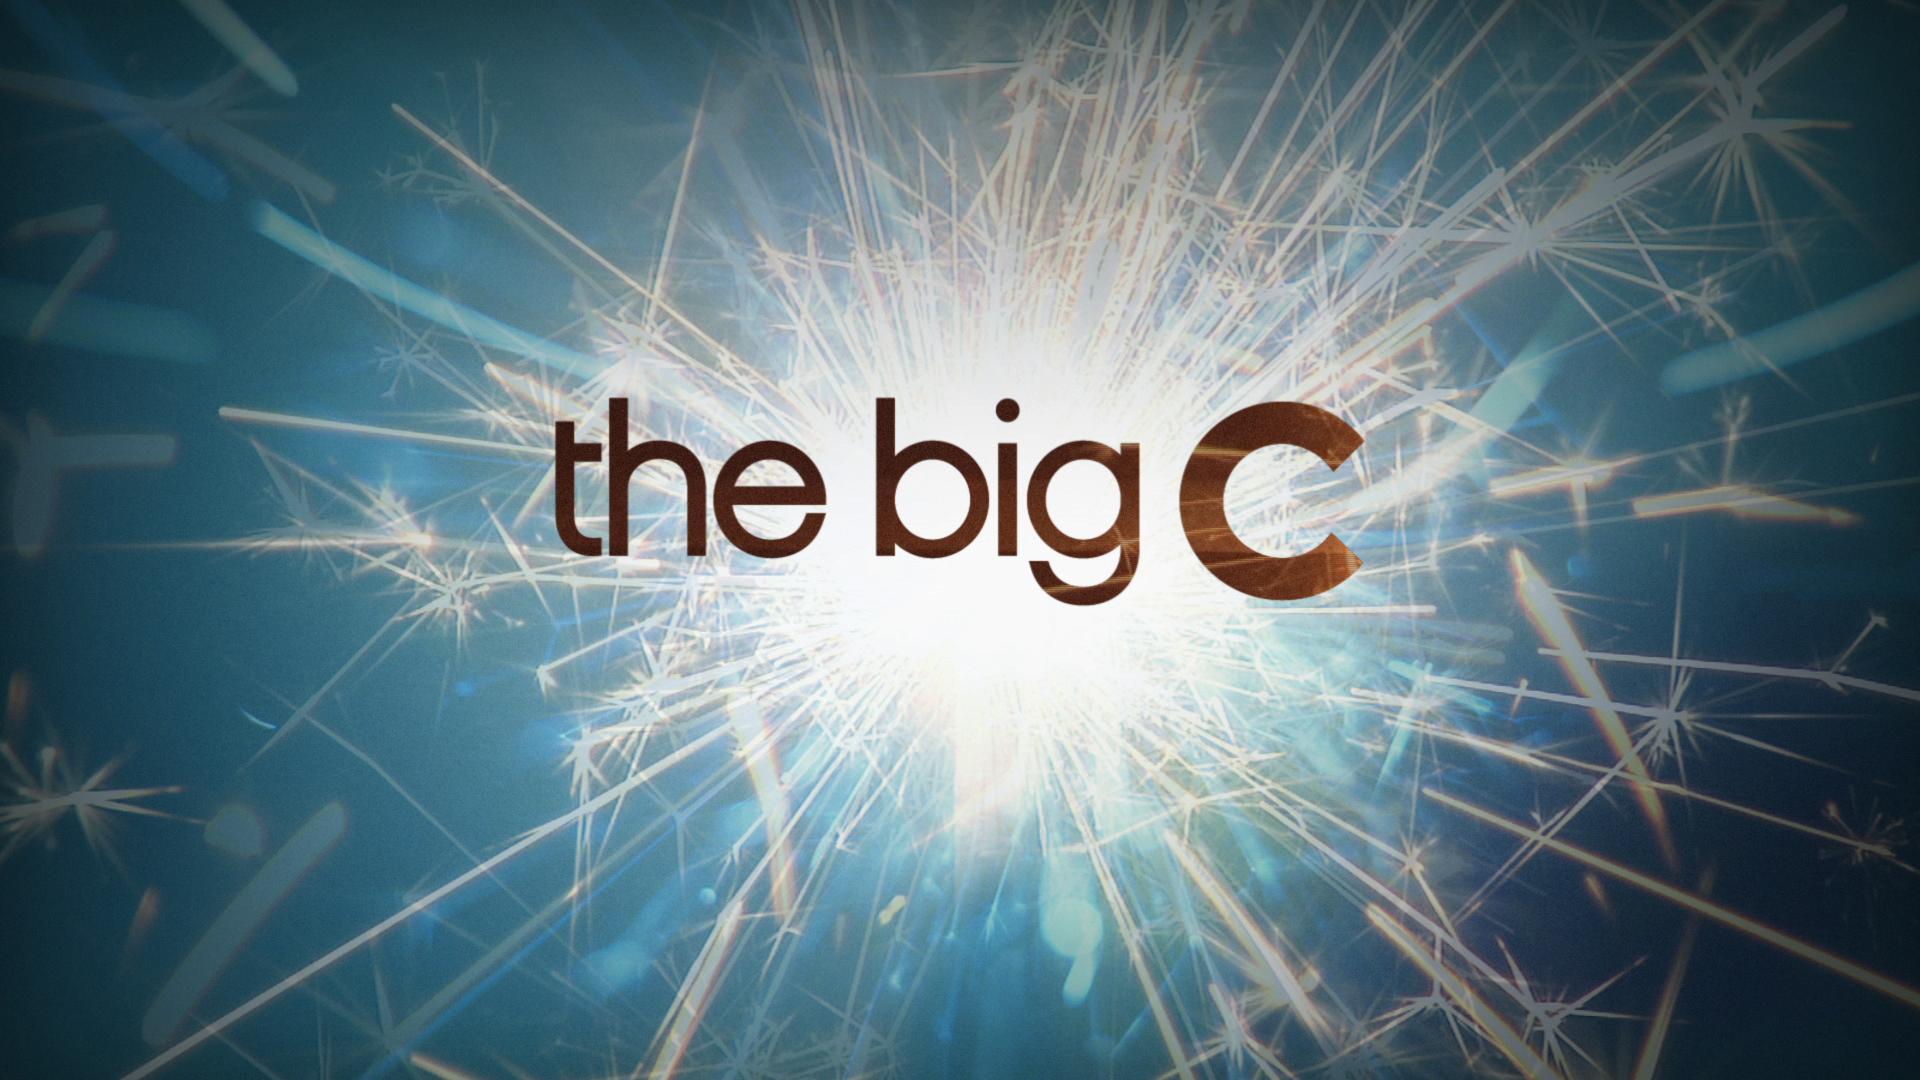 The Big C featurette about the final season